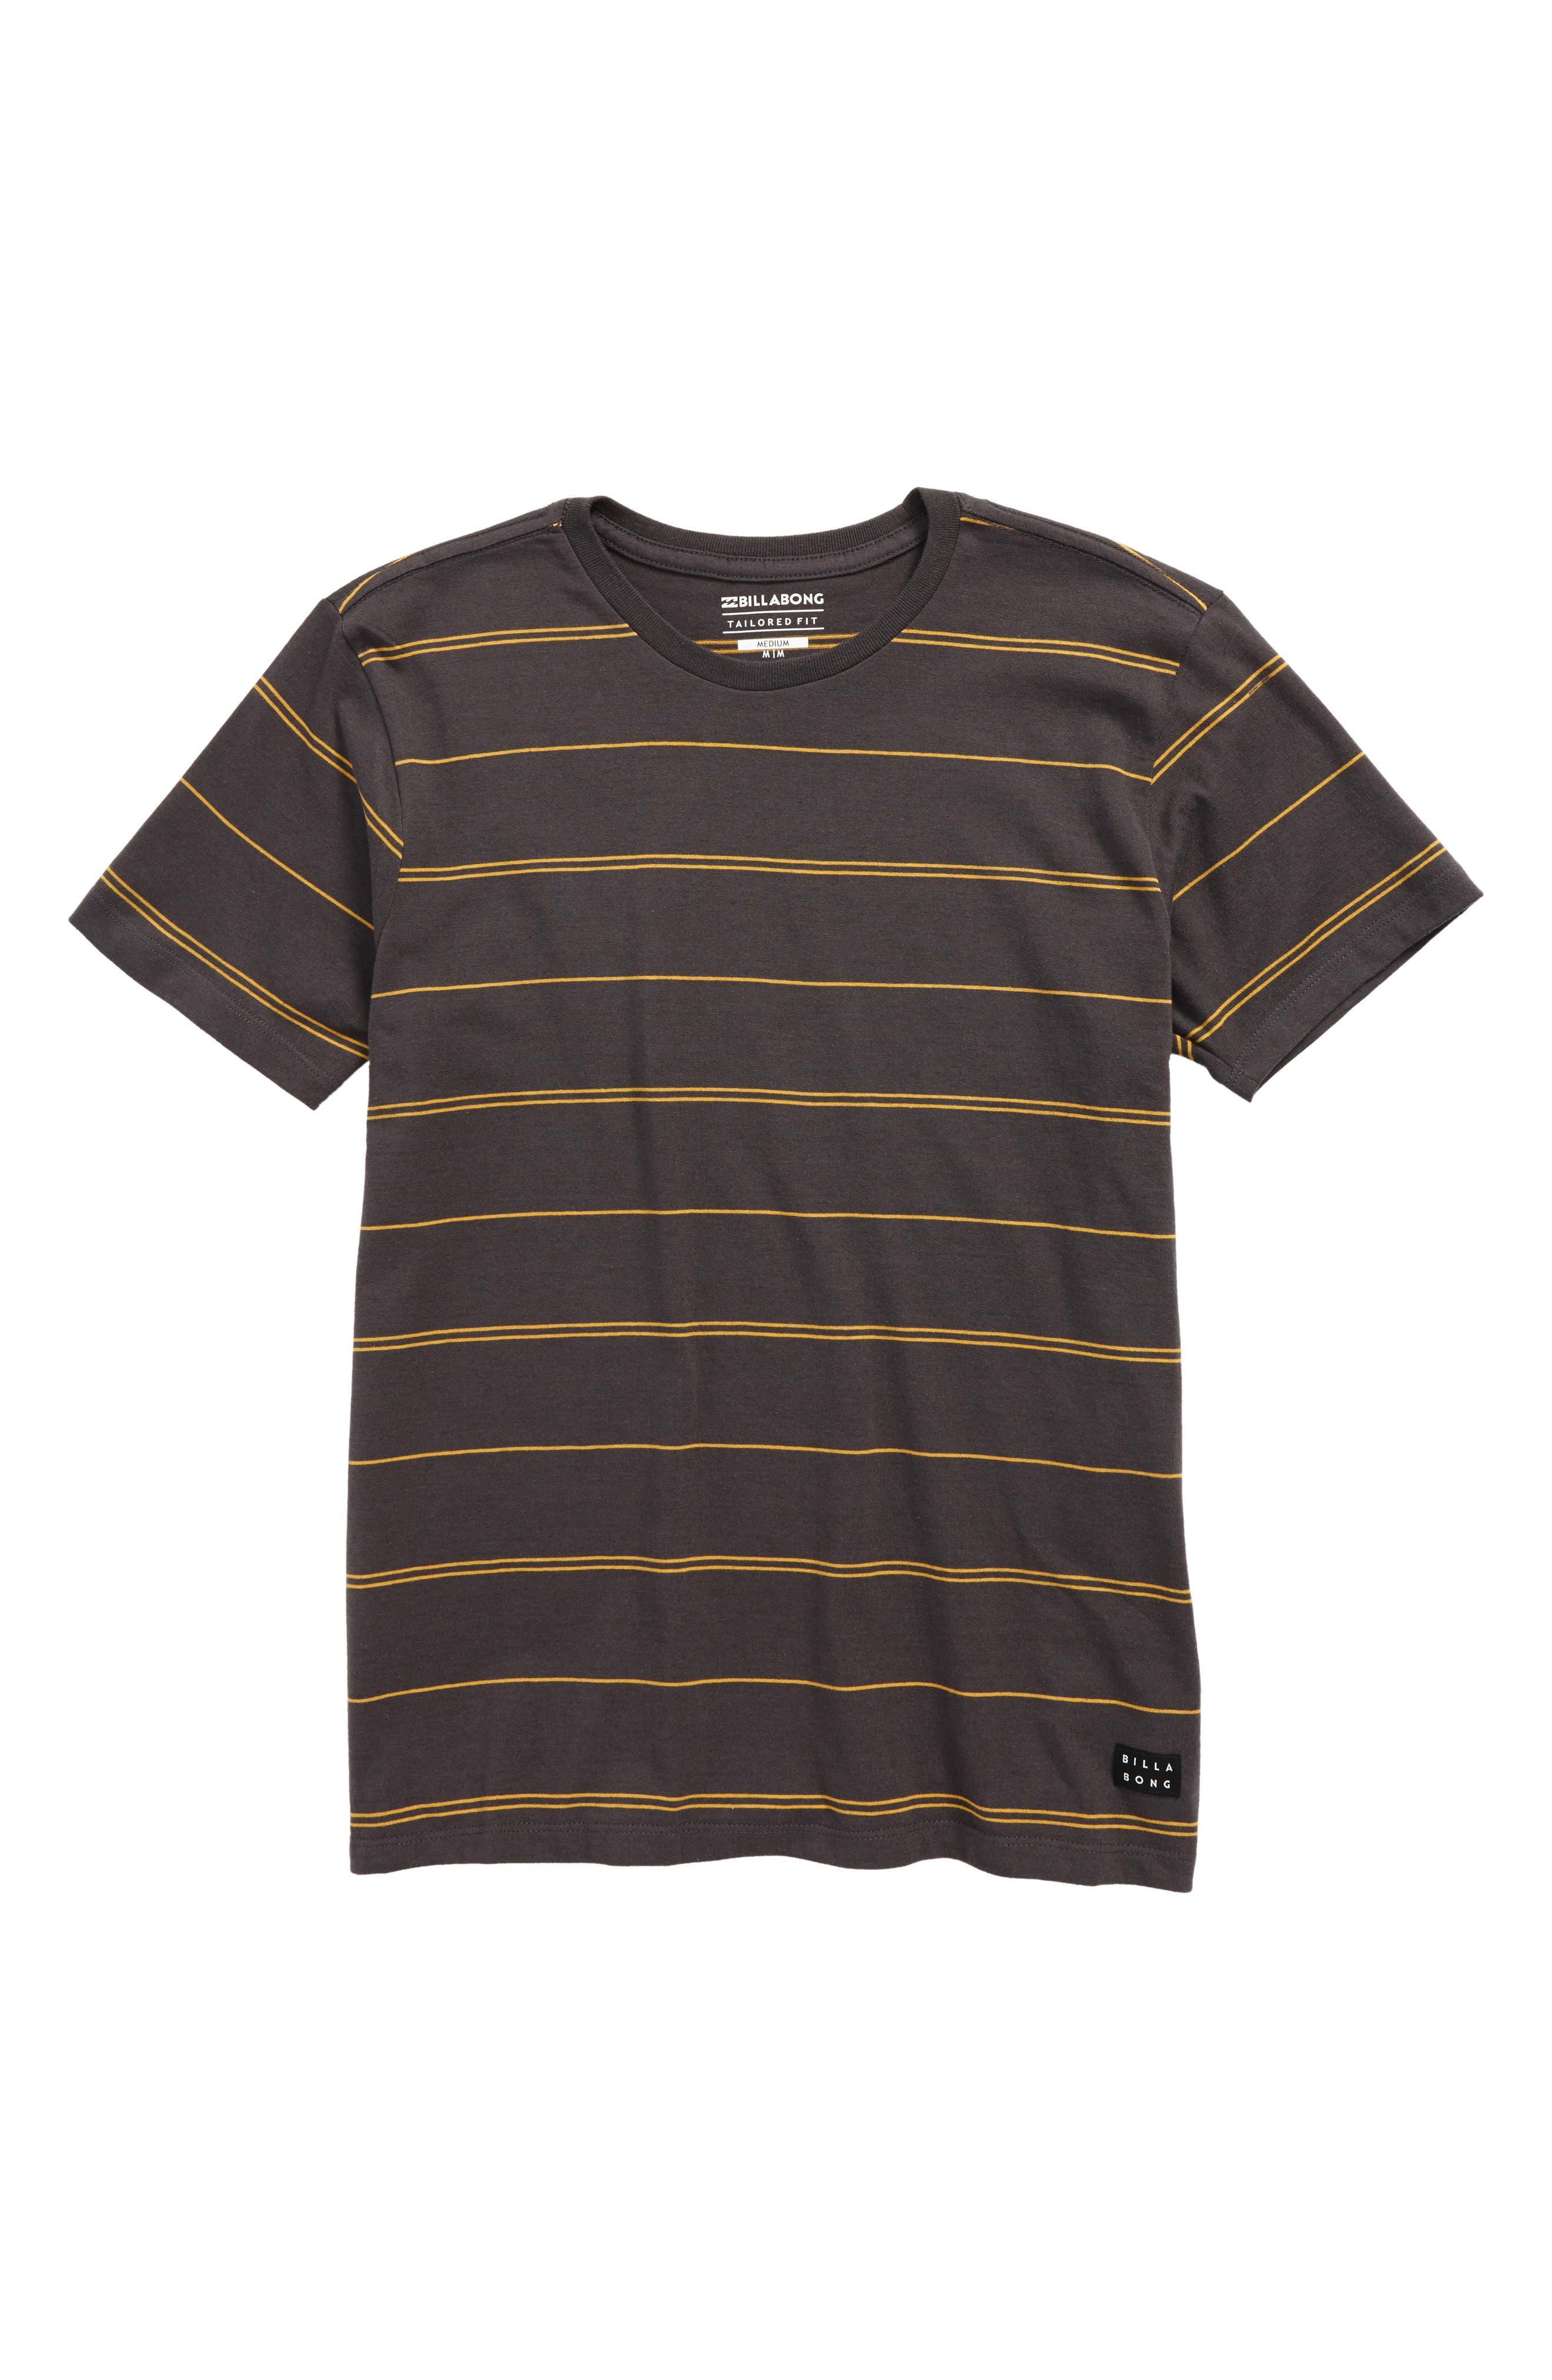 Billabong Die Cut Stripe Ringer T-Shirt (Big Boys)